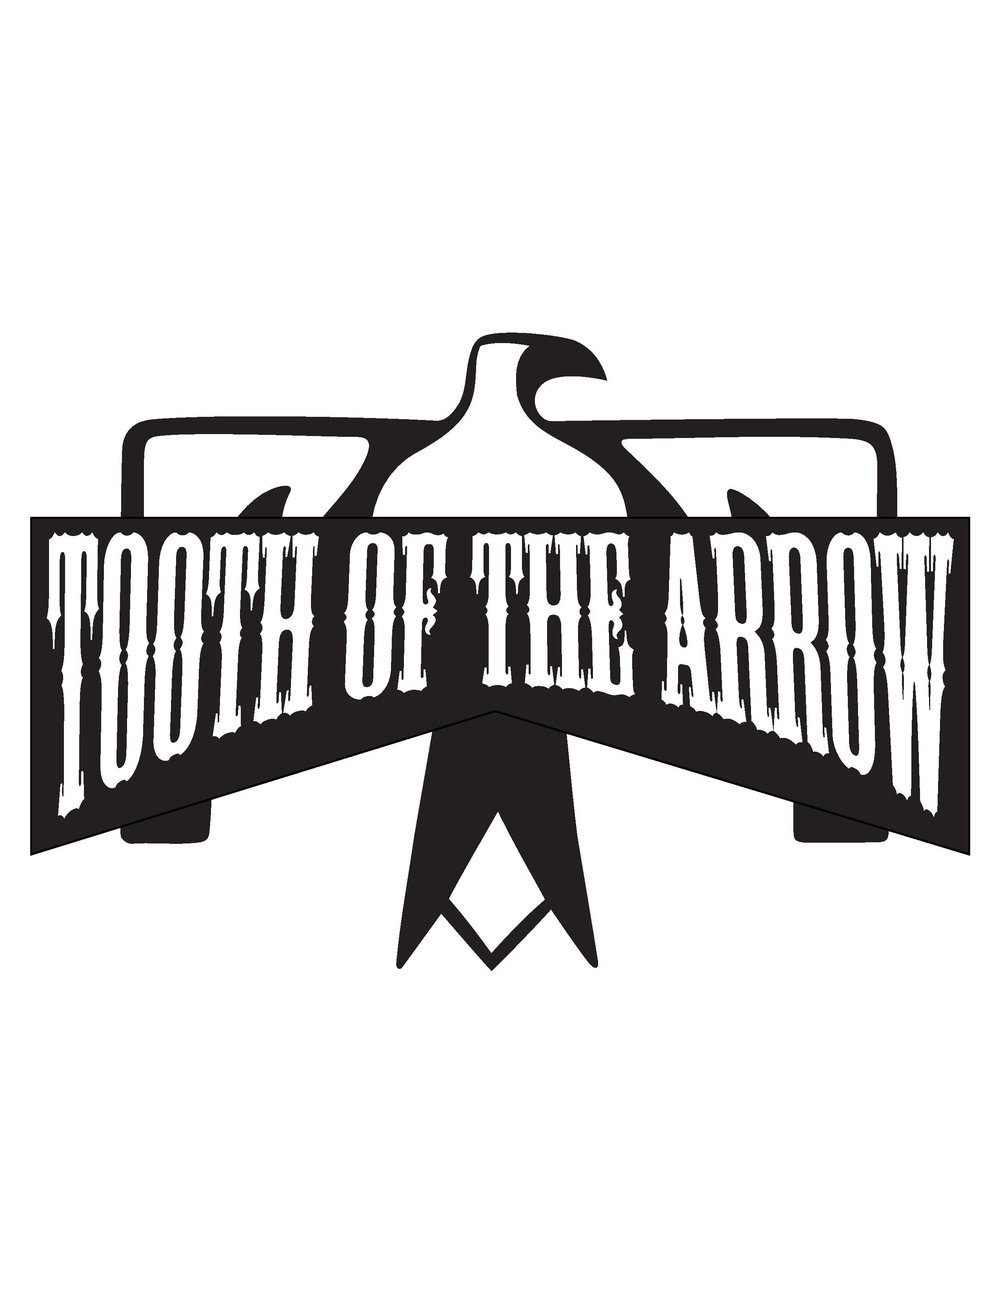 tooth-of-the-arrow-logo-final_2550x.jpg